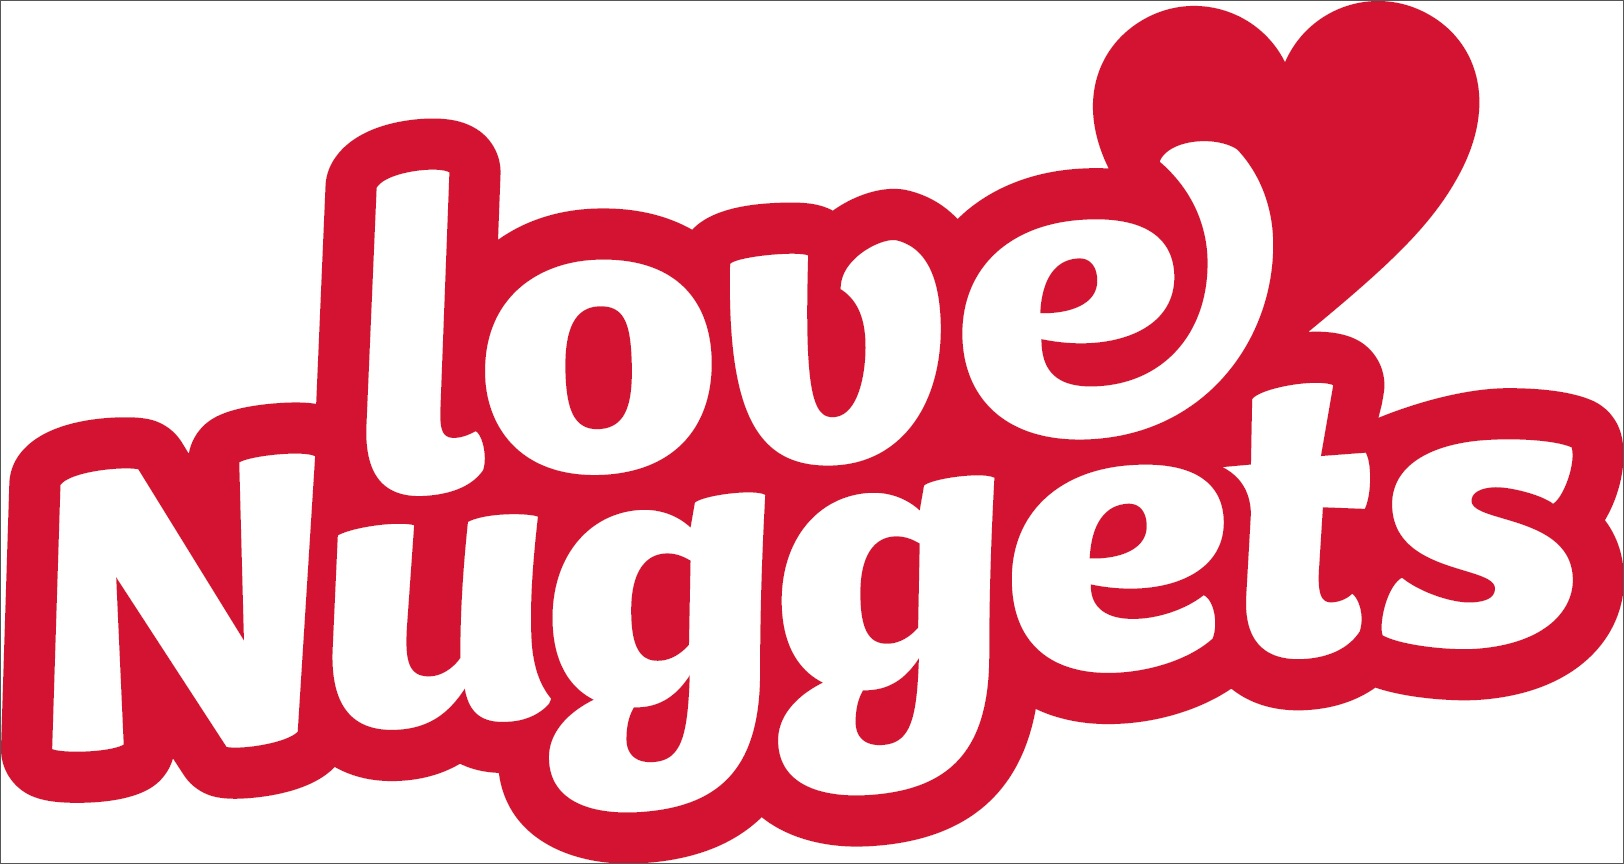 OnePlusOne's Love Nuggets logo